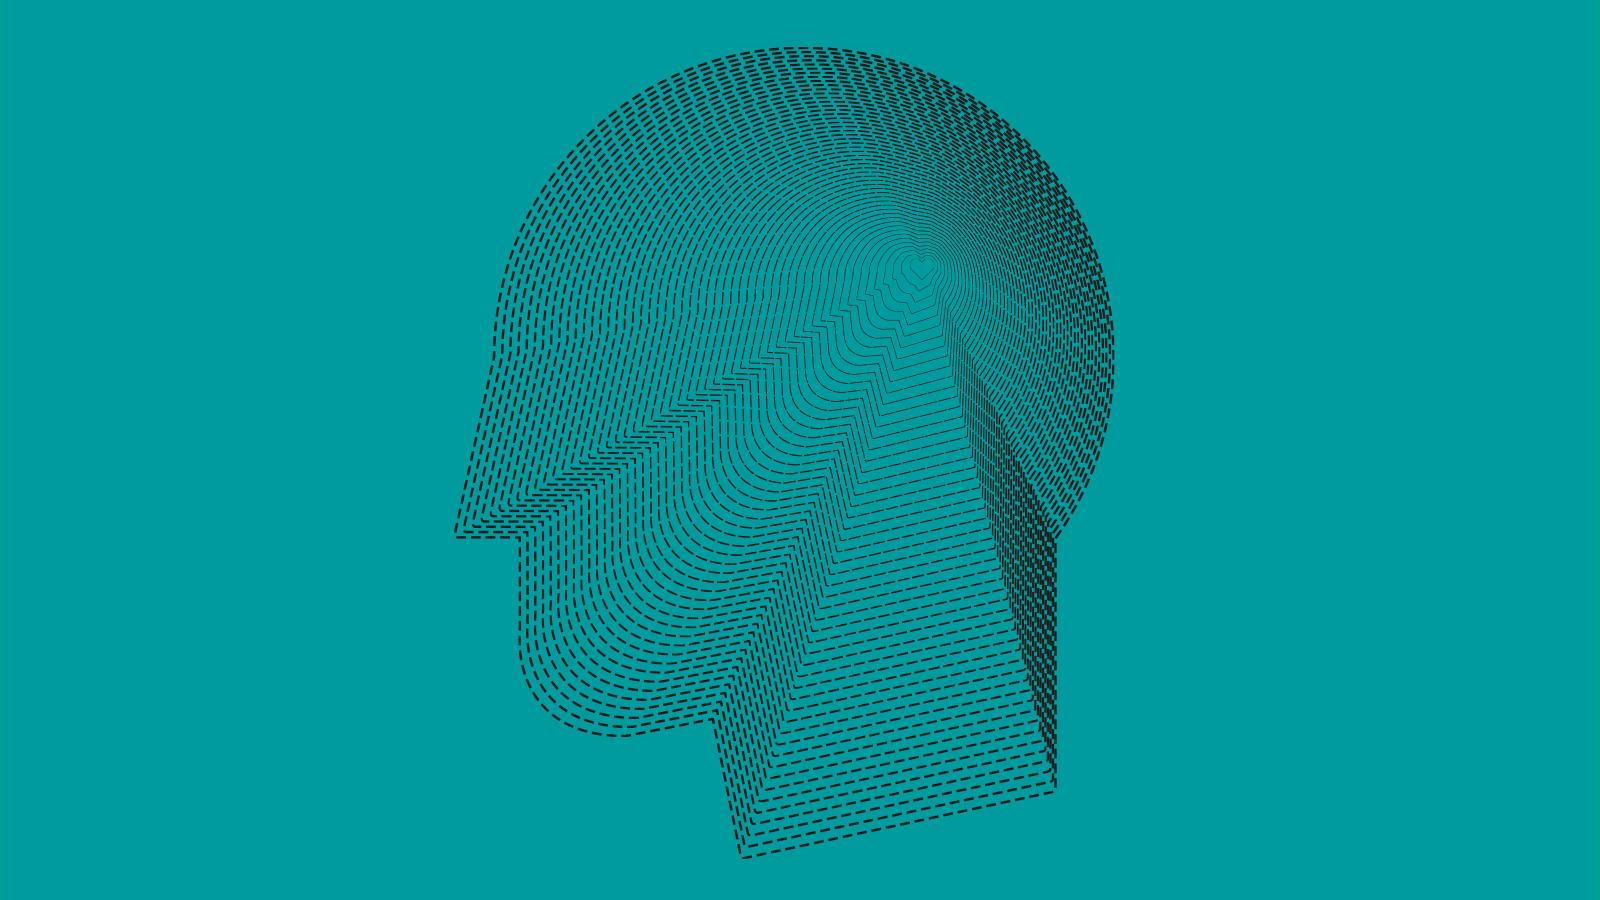 creative-identity-design-logo-small-business-branding-hypnotherapy-milton-keynes-london3